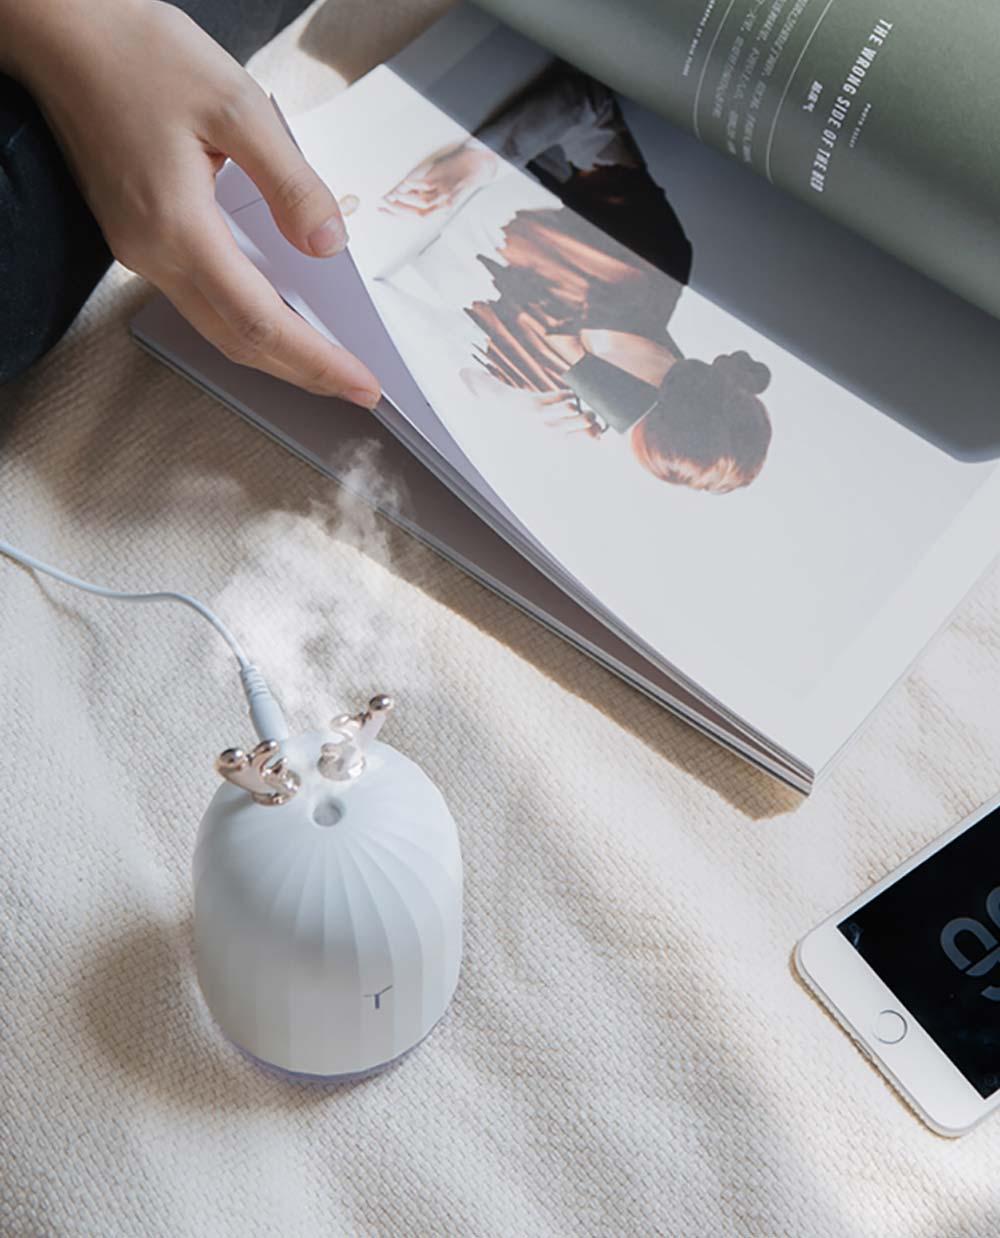 Mini Desk Humidifier, Ultrasonic USB Humidifier Essential Oil Diffuser Aromatherapy Household Rabbit Deer Design 21